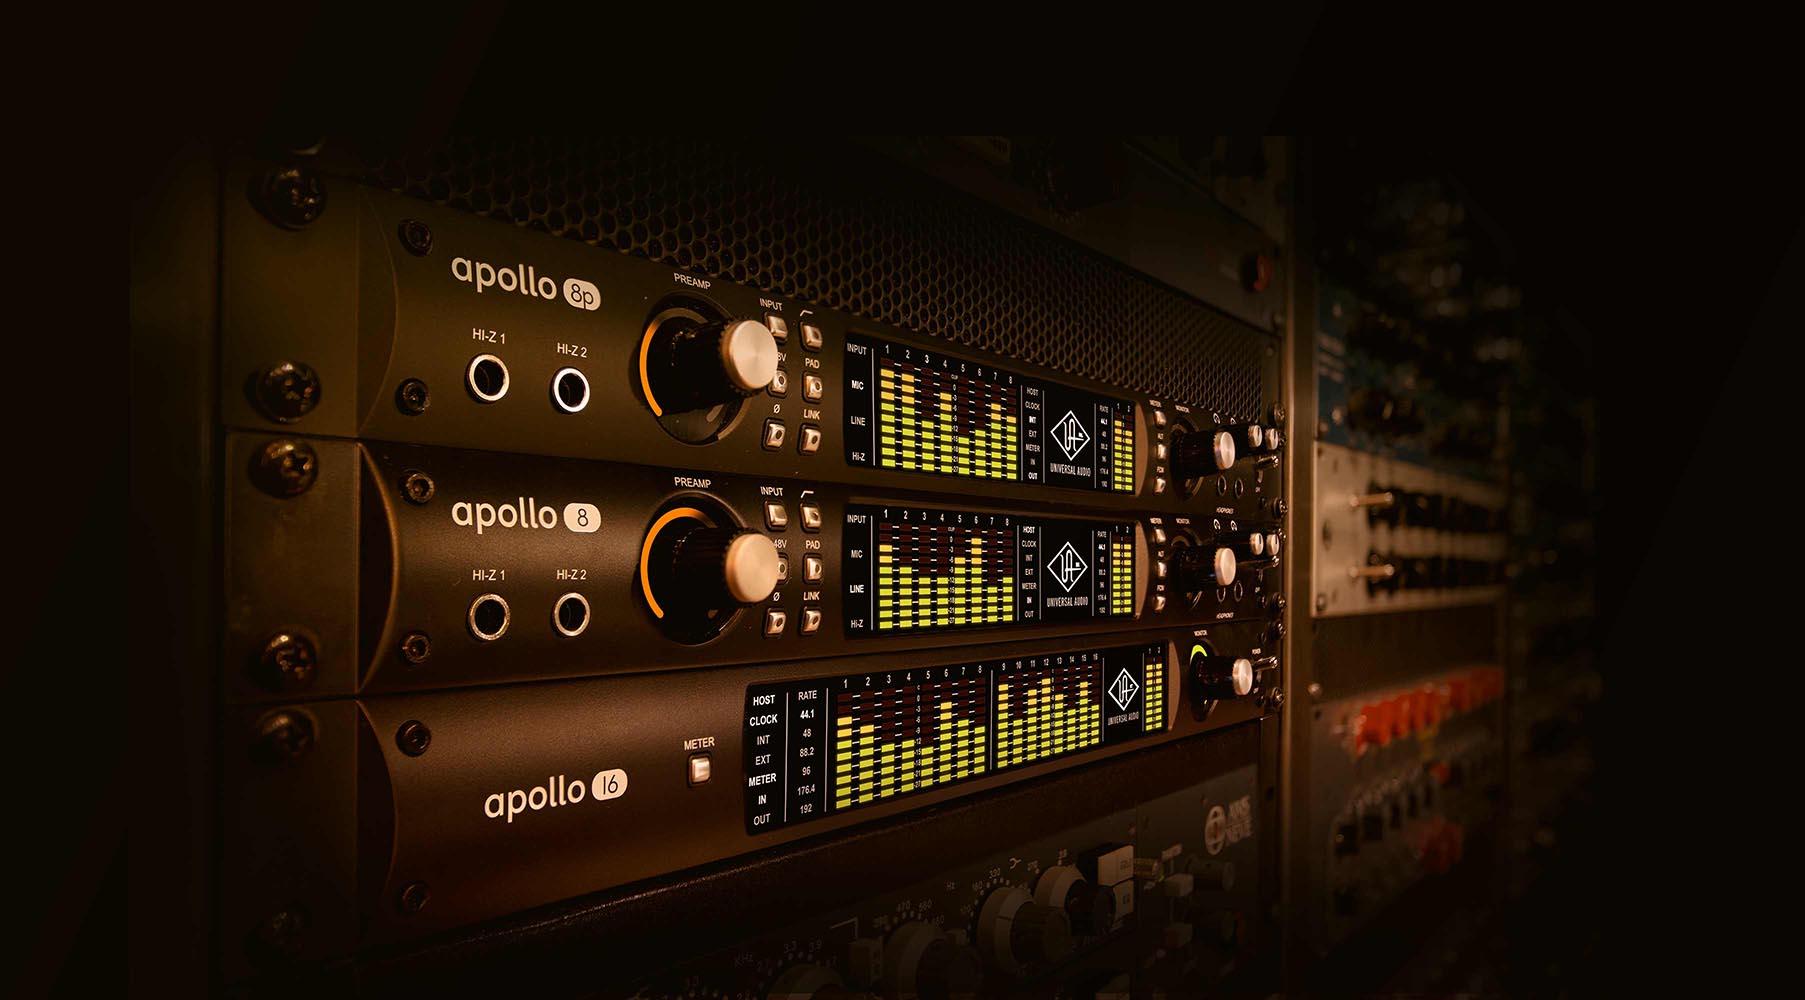 Www 3d Hd Live Wallpaper Com Universal Audio Audio Interfaces Uad Plug Ins